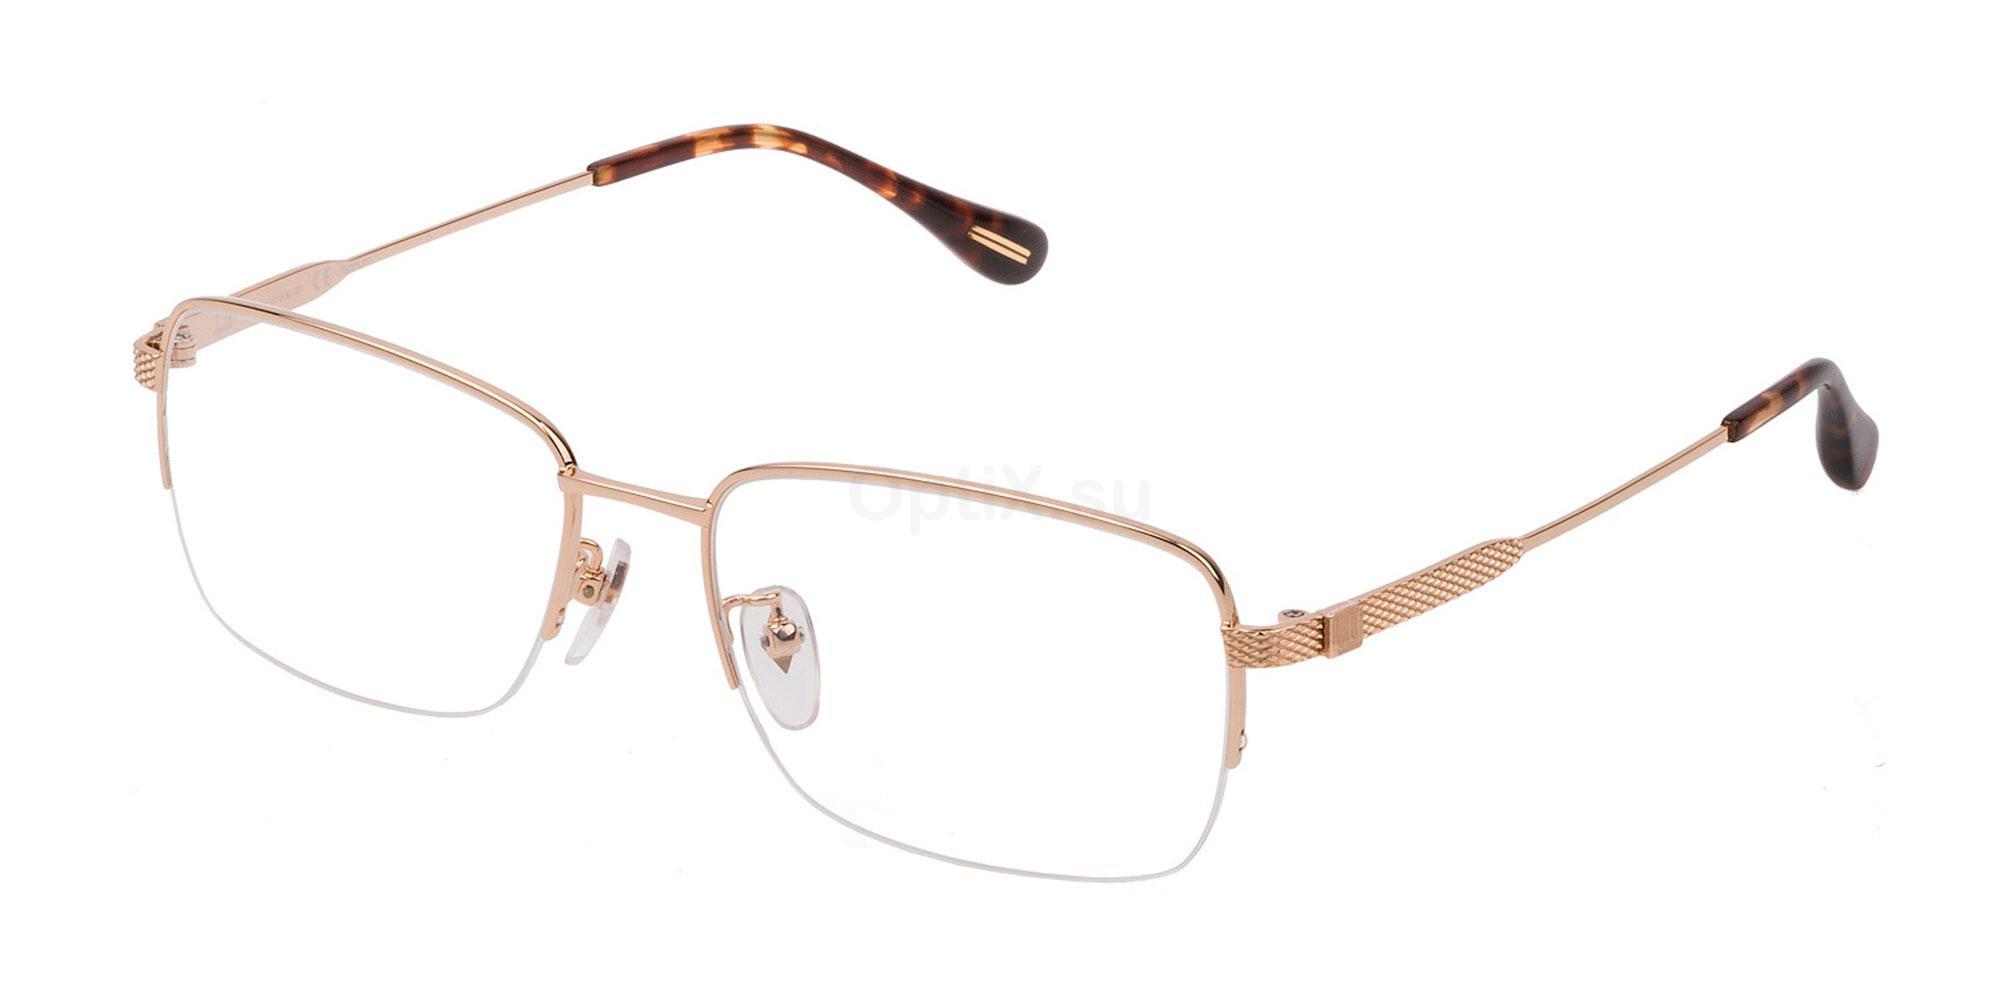 0300 VDH168G Glasses, Dunhill London